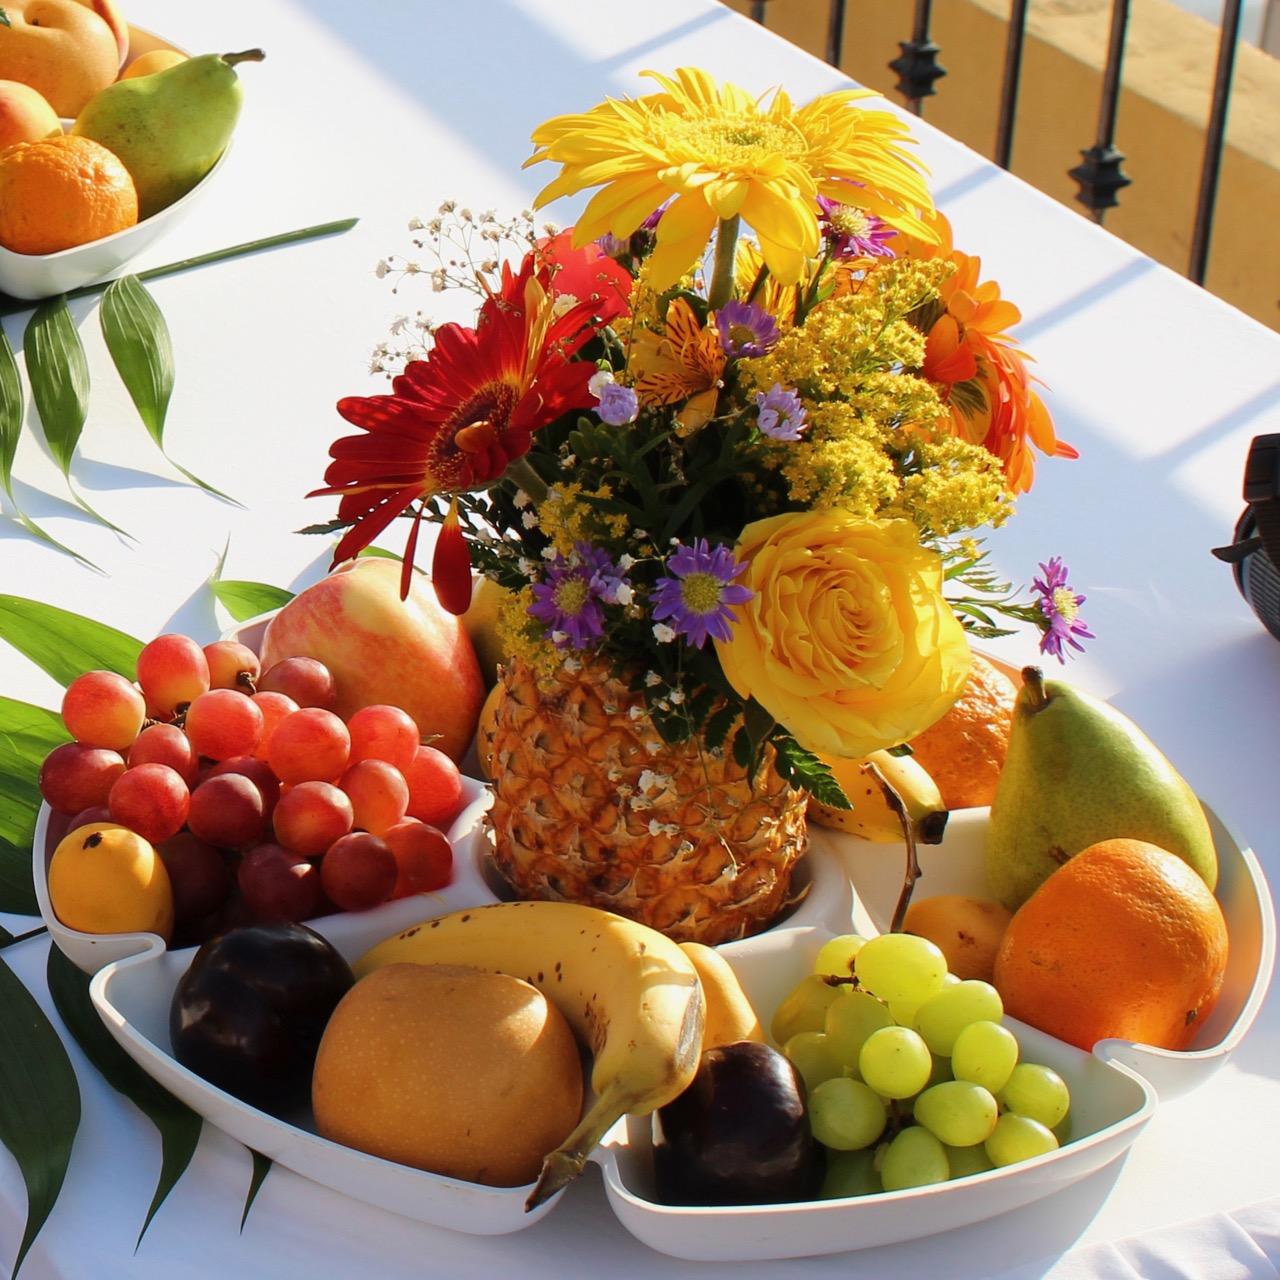 Wertvolles Exportgut: Obst aus mexikanischem Anbau